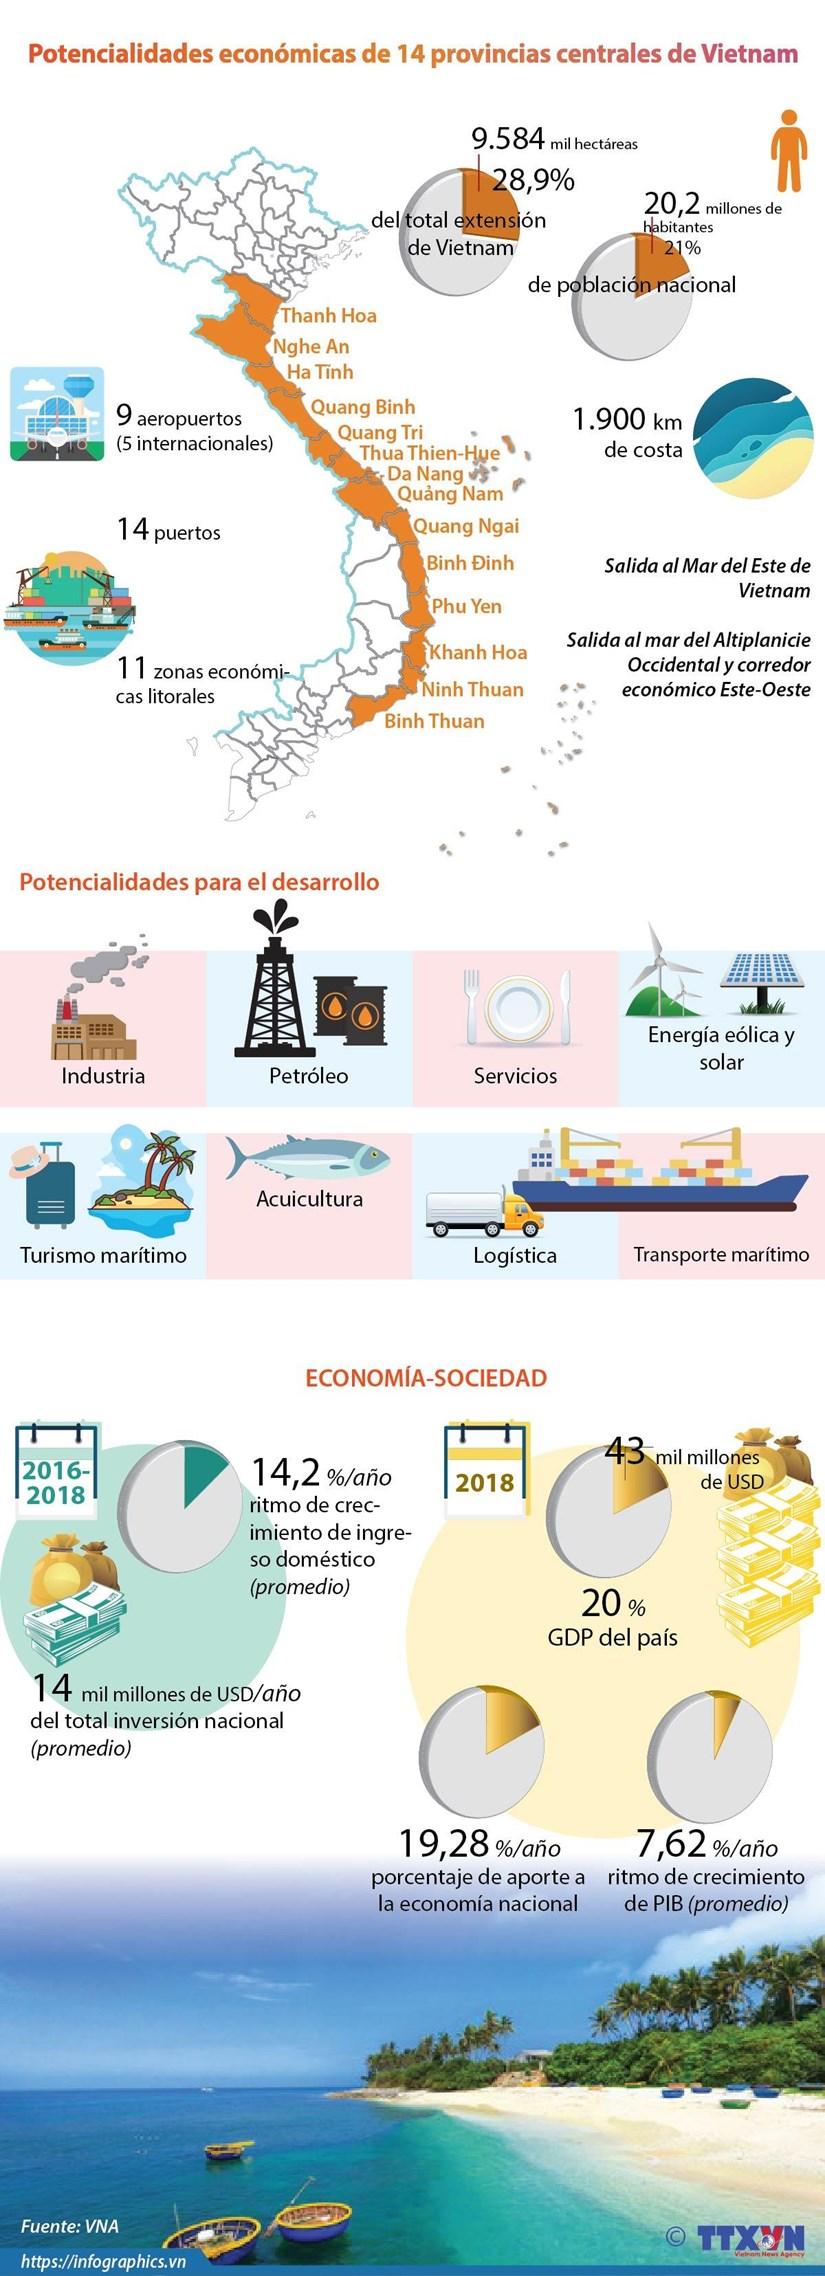 [Info] Potencialidades economicas de 14 provincias centrales de Vietnam hinh anh 1